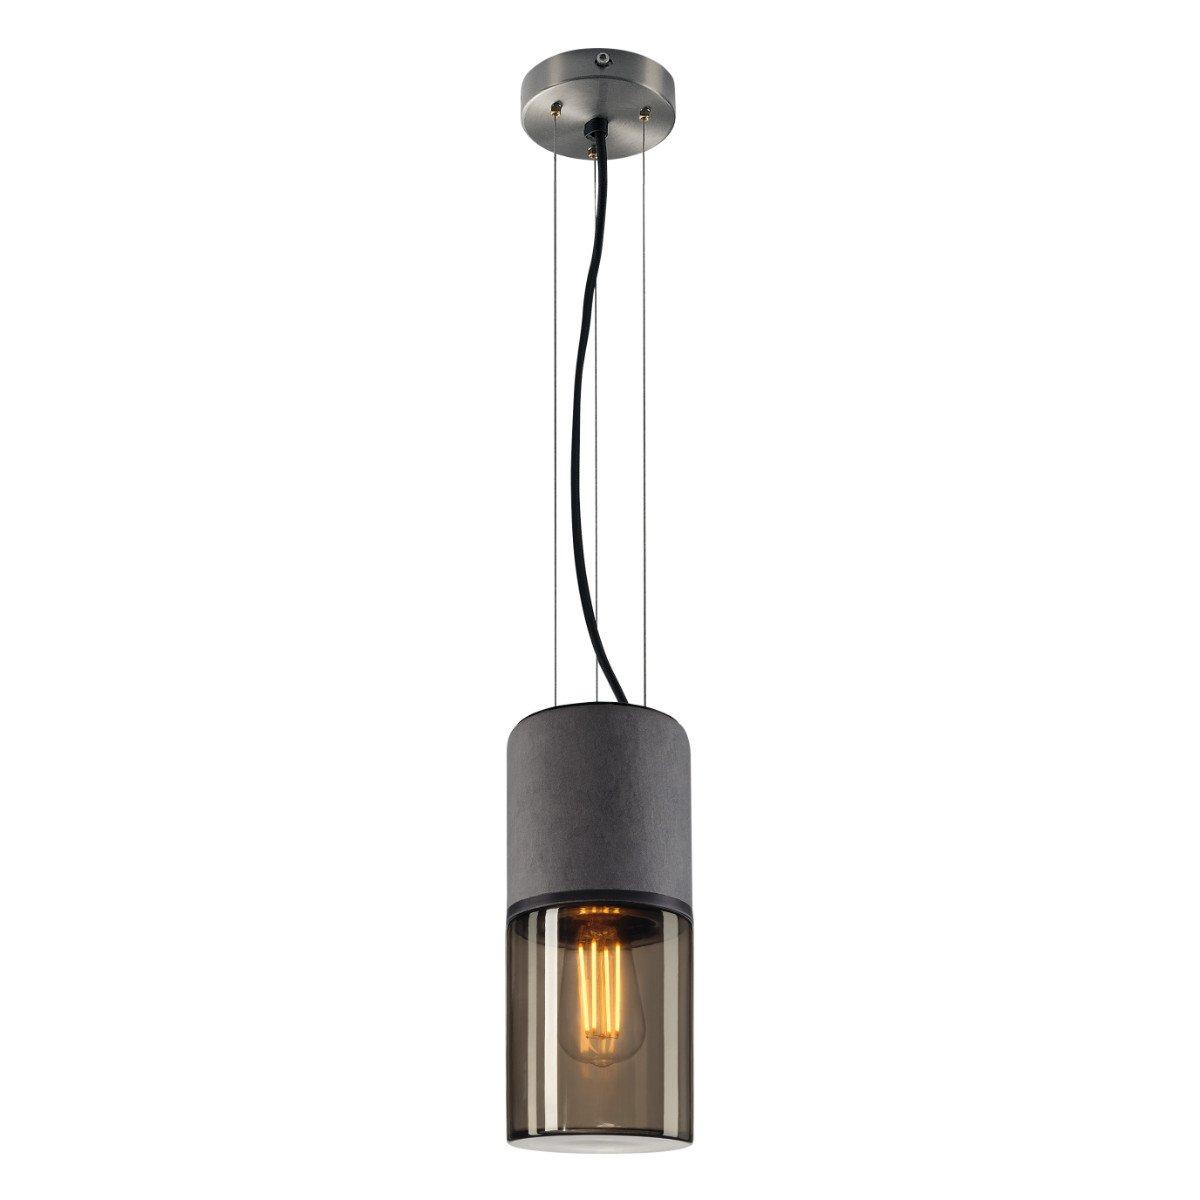 SLV - verlichting Hanglamp Lisenne Stone SLV. 155714